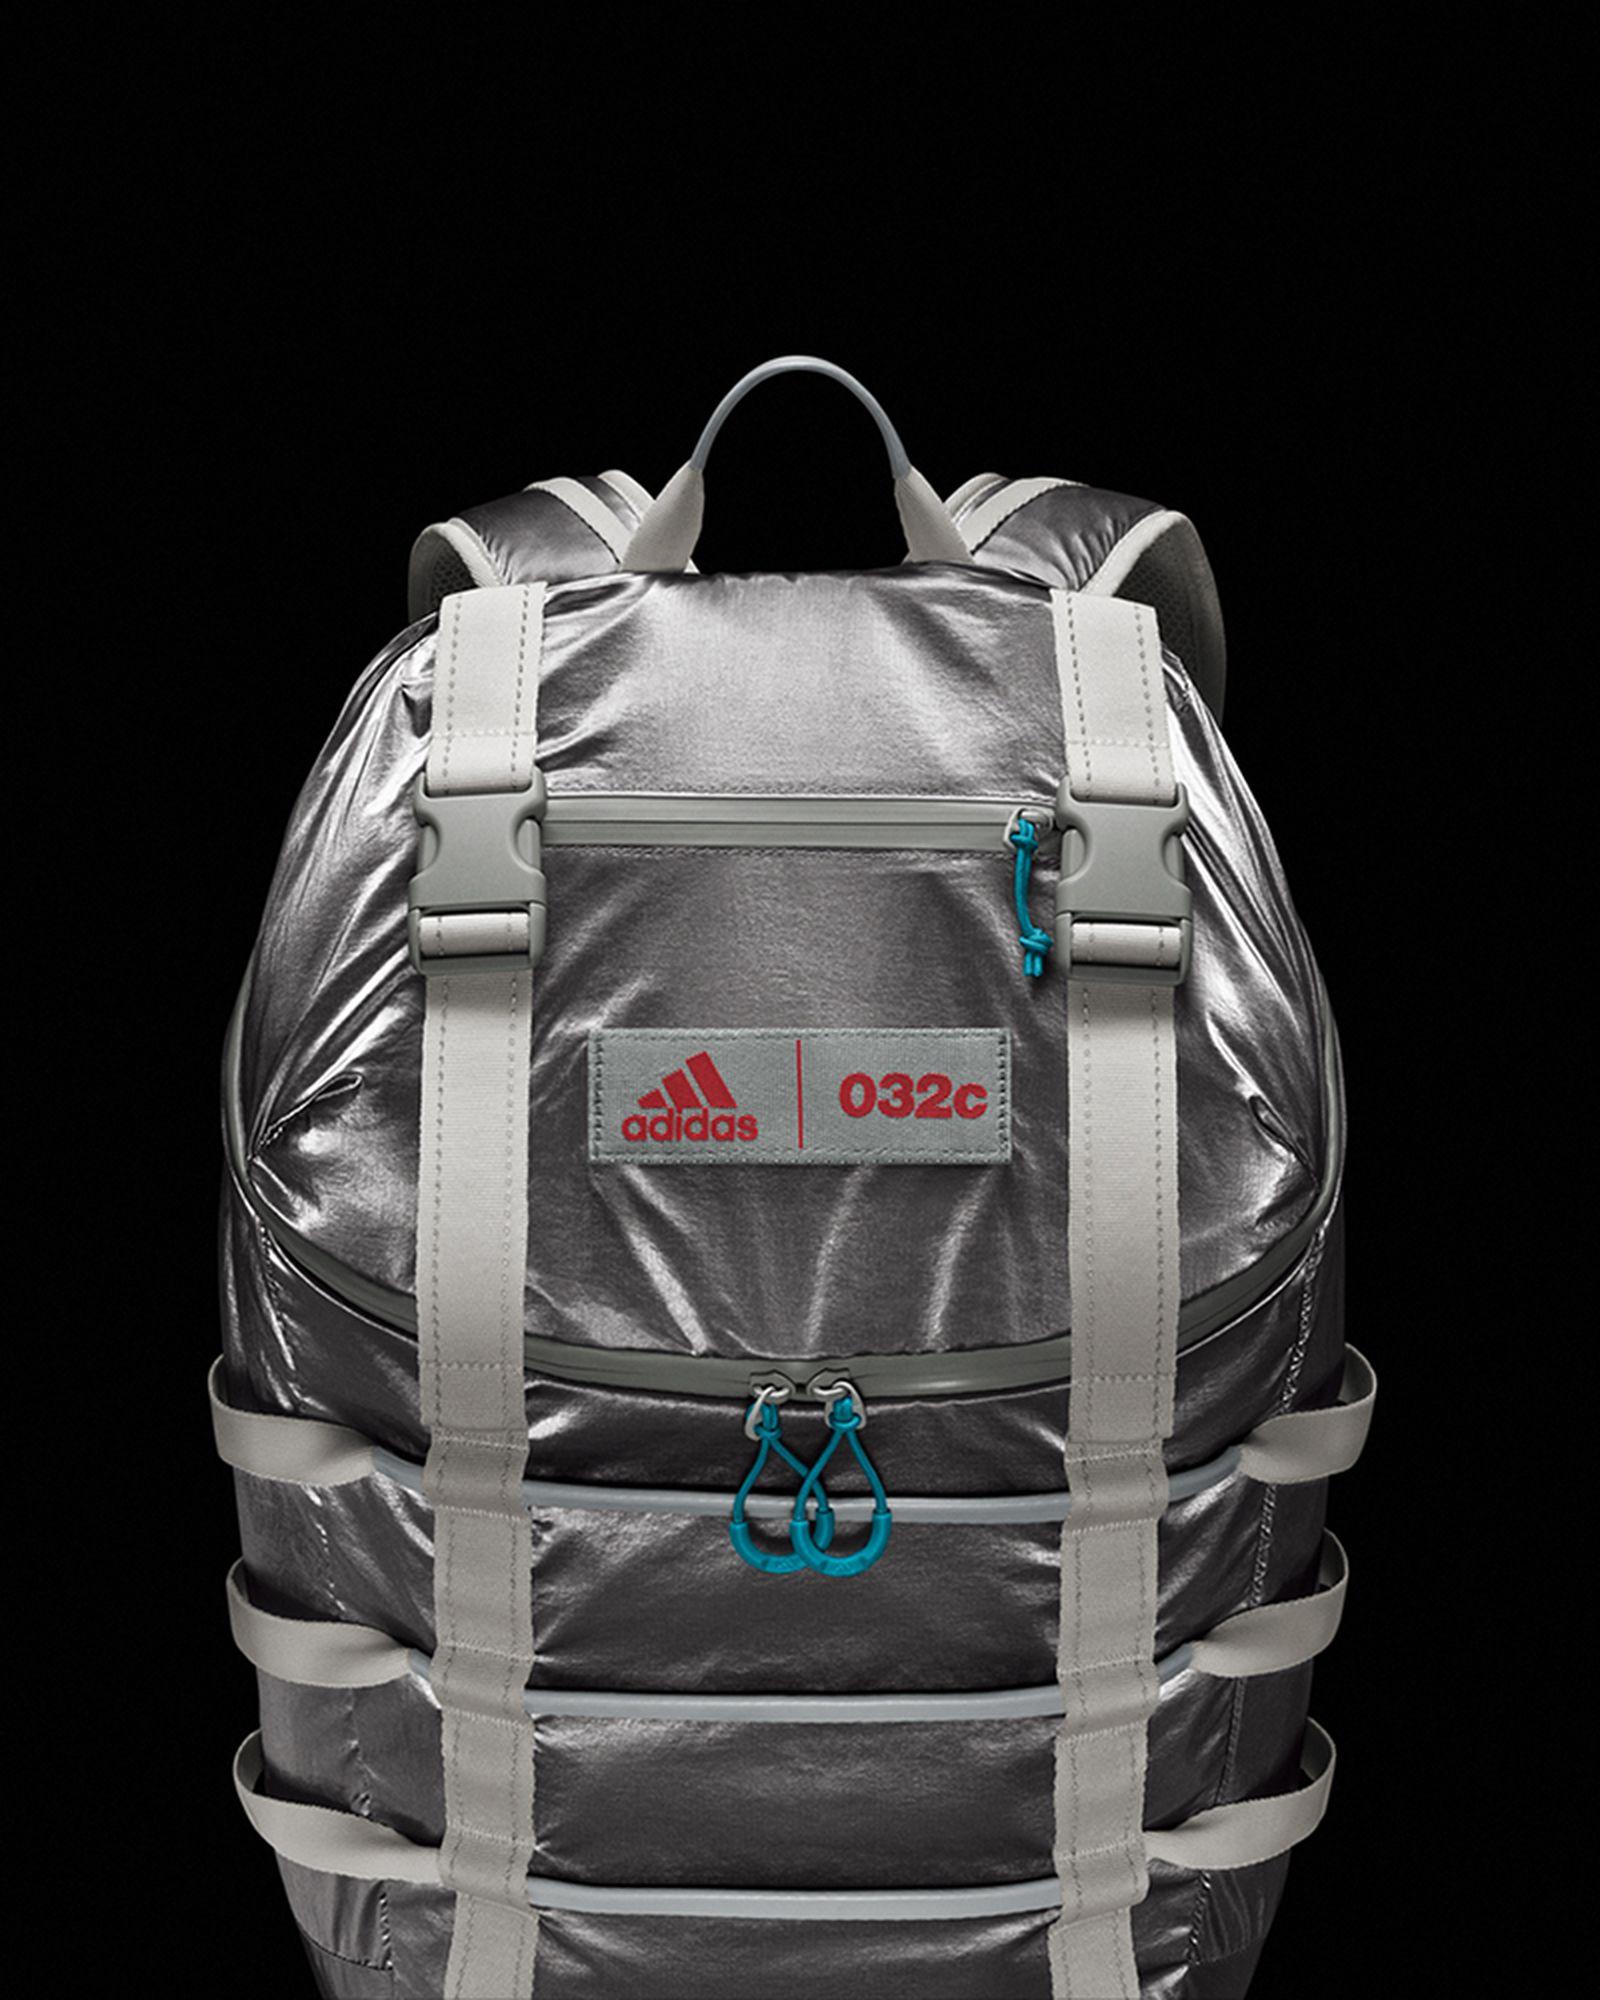 032c-adidas-05